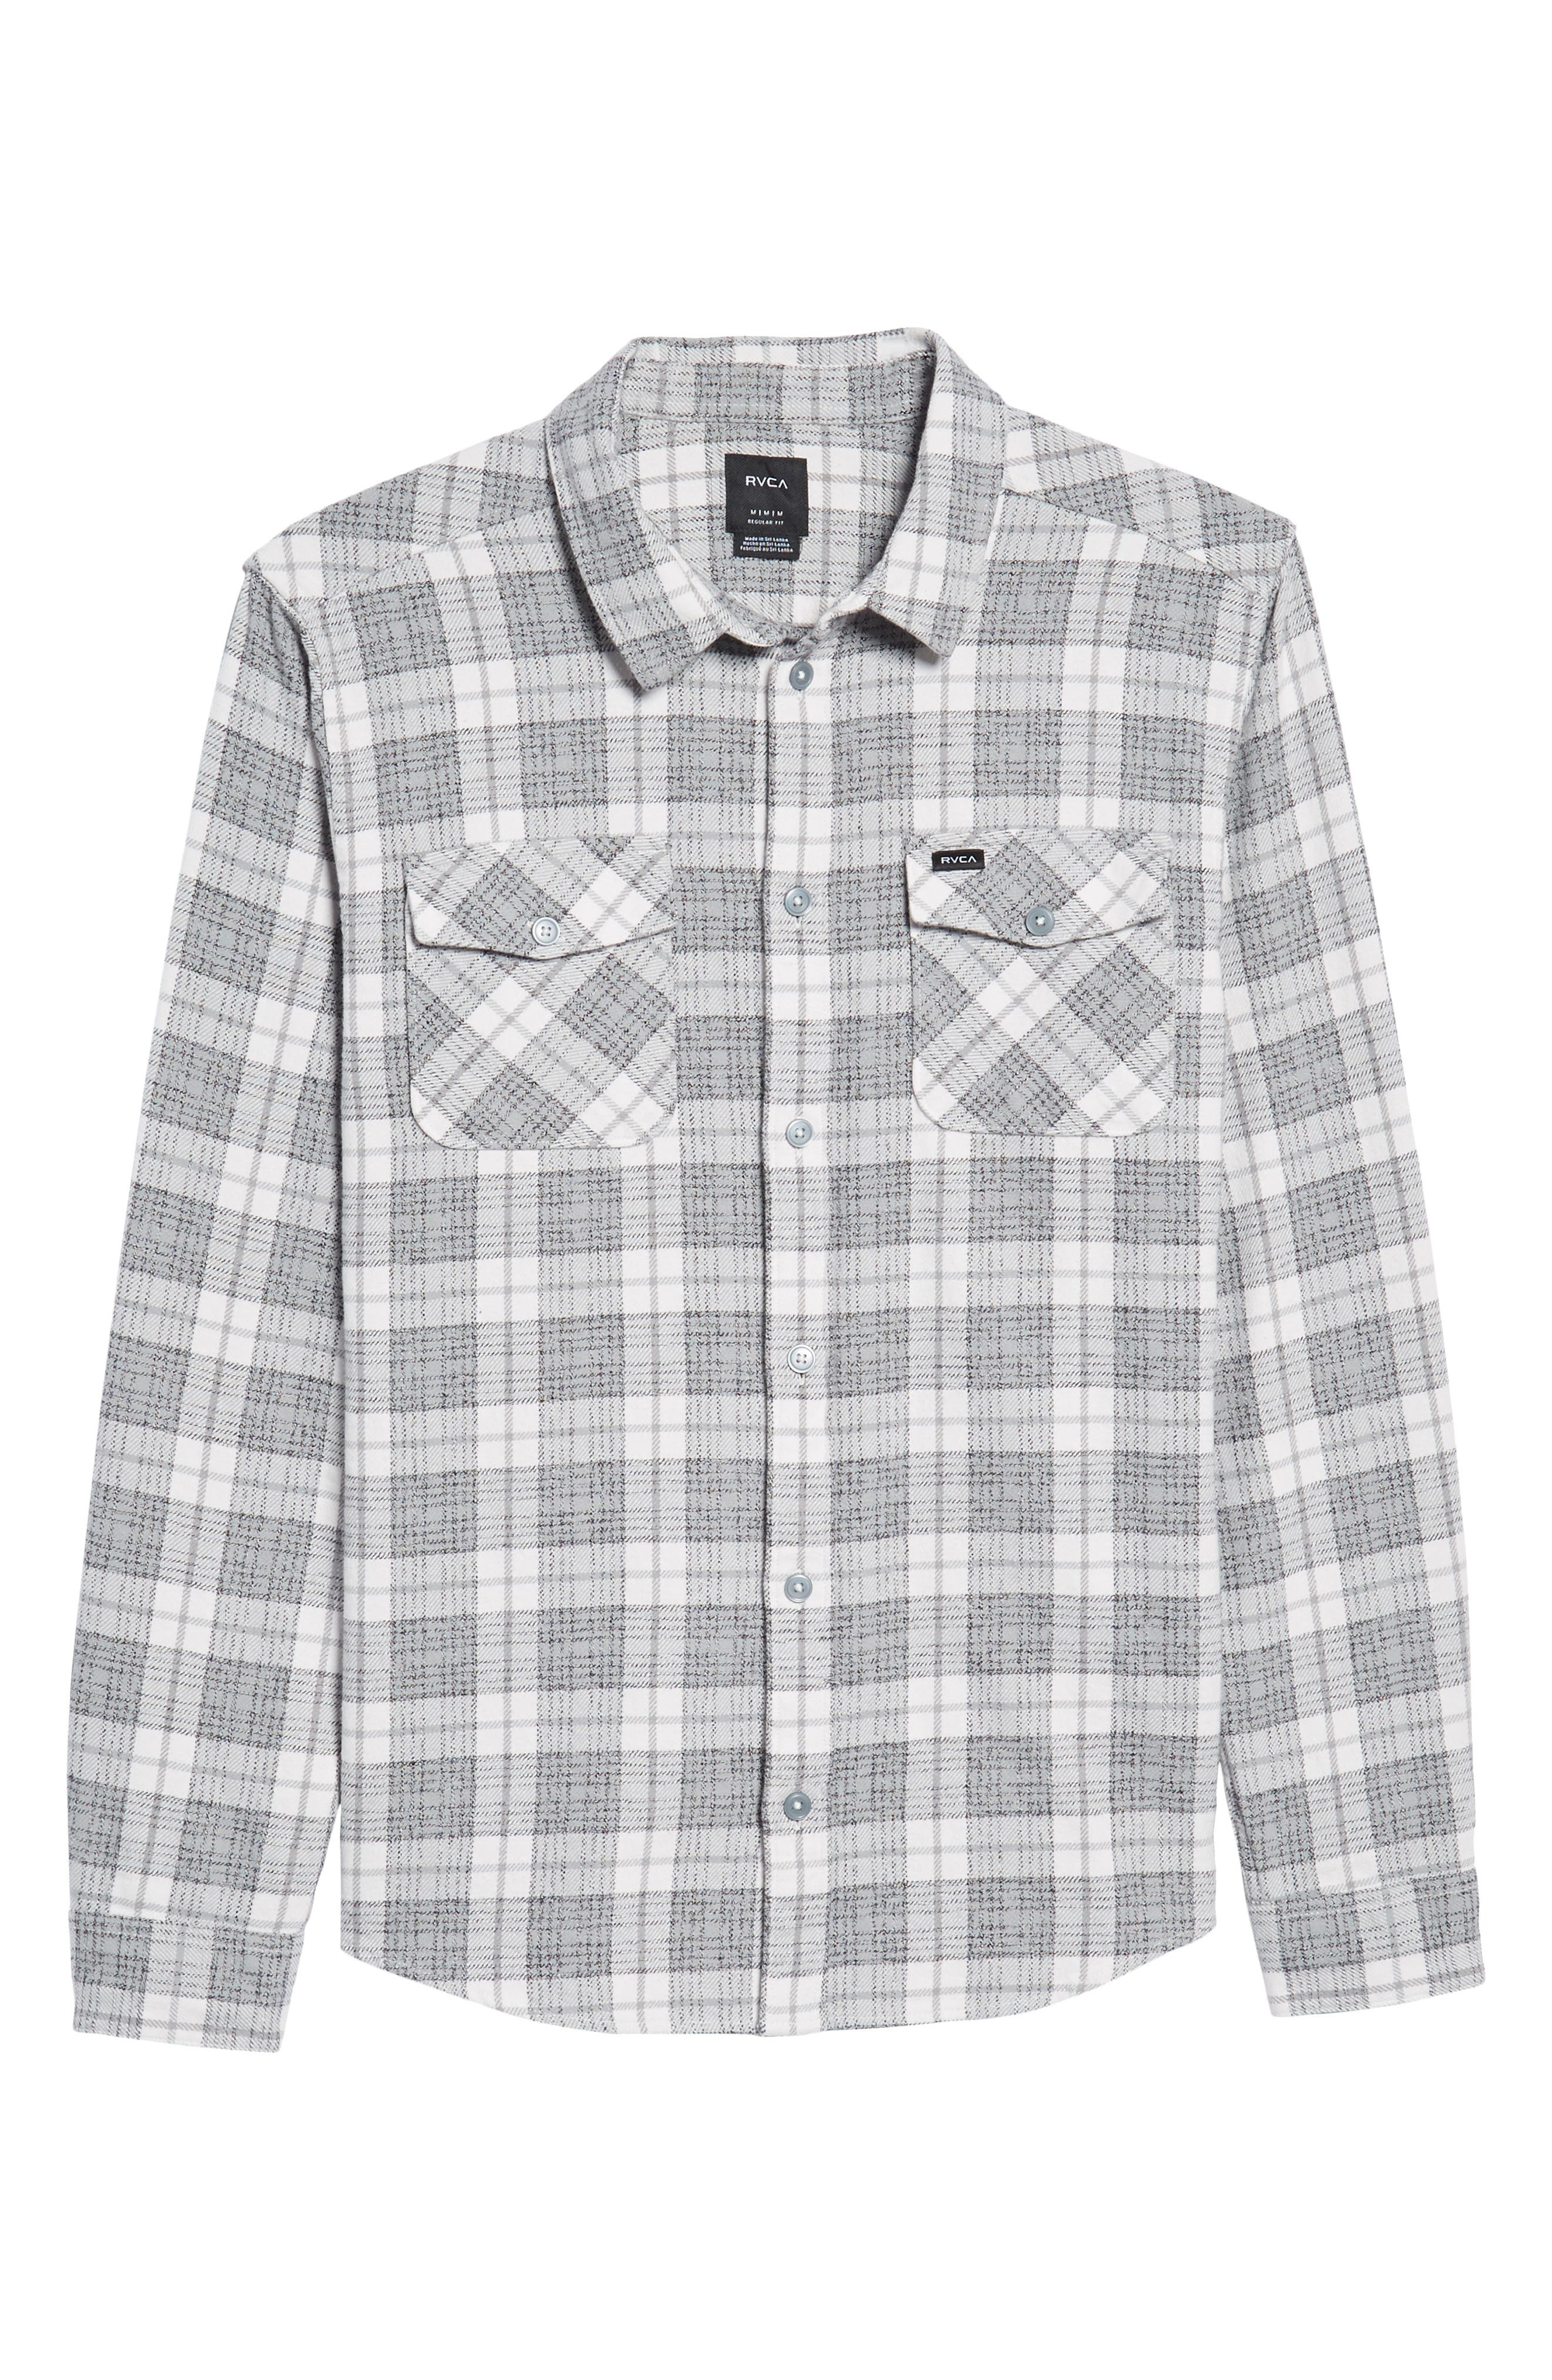 RVCA, 'That'll Work' Trim Fit Plaid Flannel Shirt, Alternate thumbnail 6, color, ANTIQUE WHITE